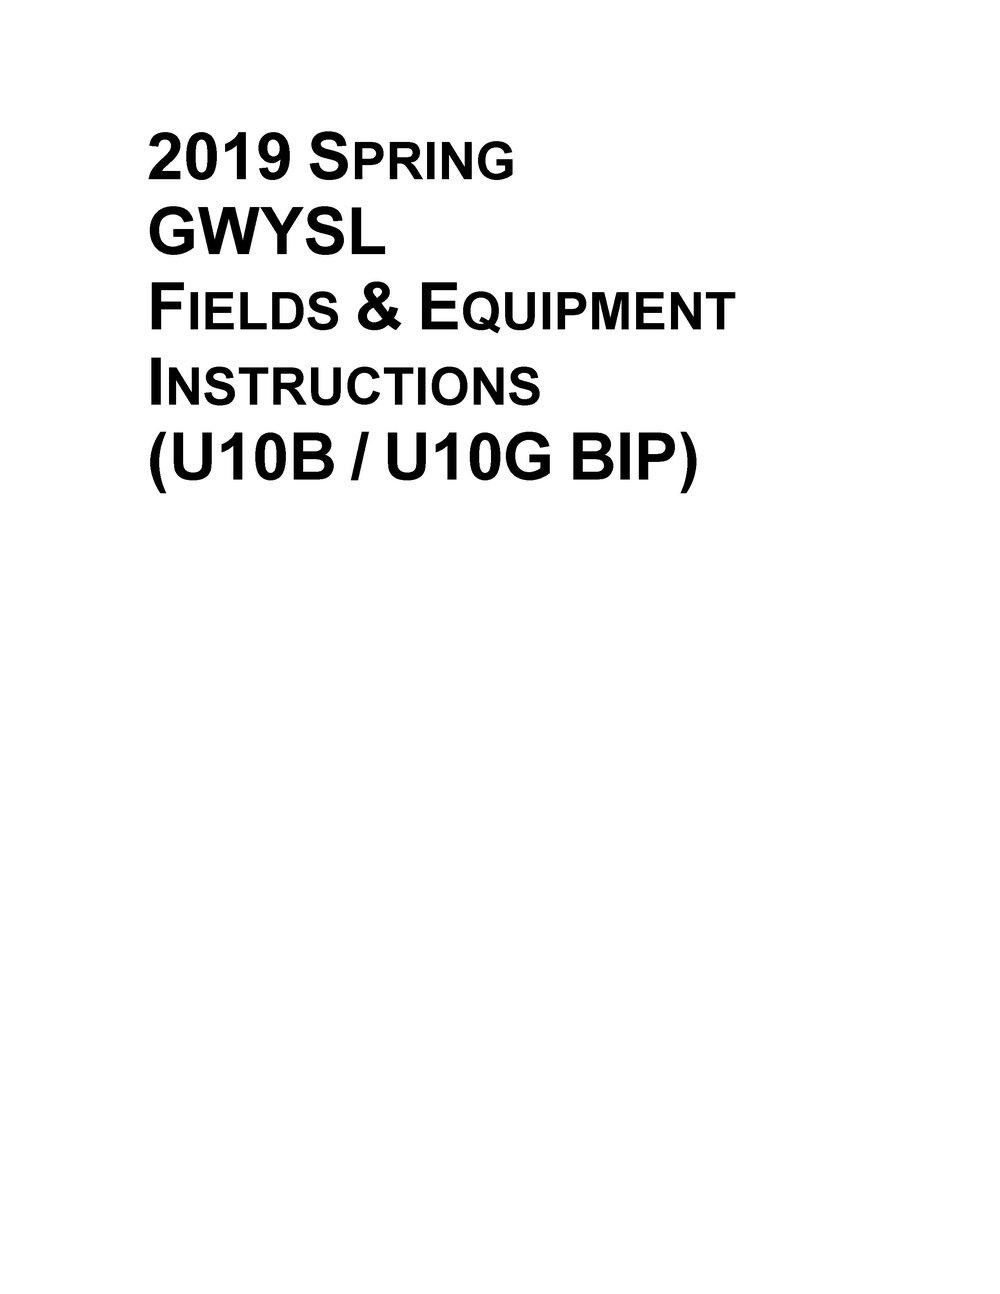 2019 Spring Instructions U10_1_01.jpg